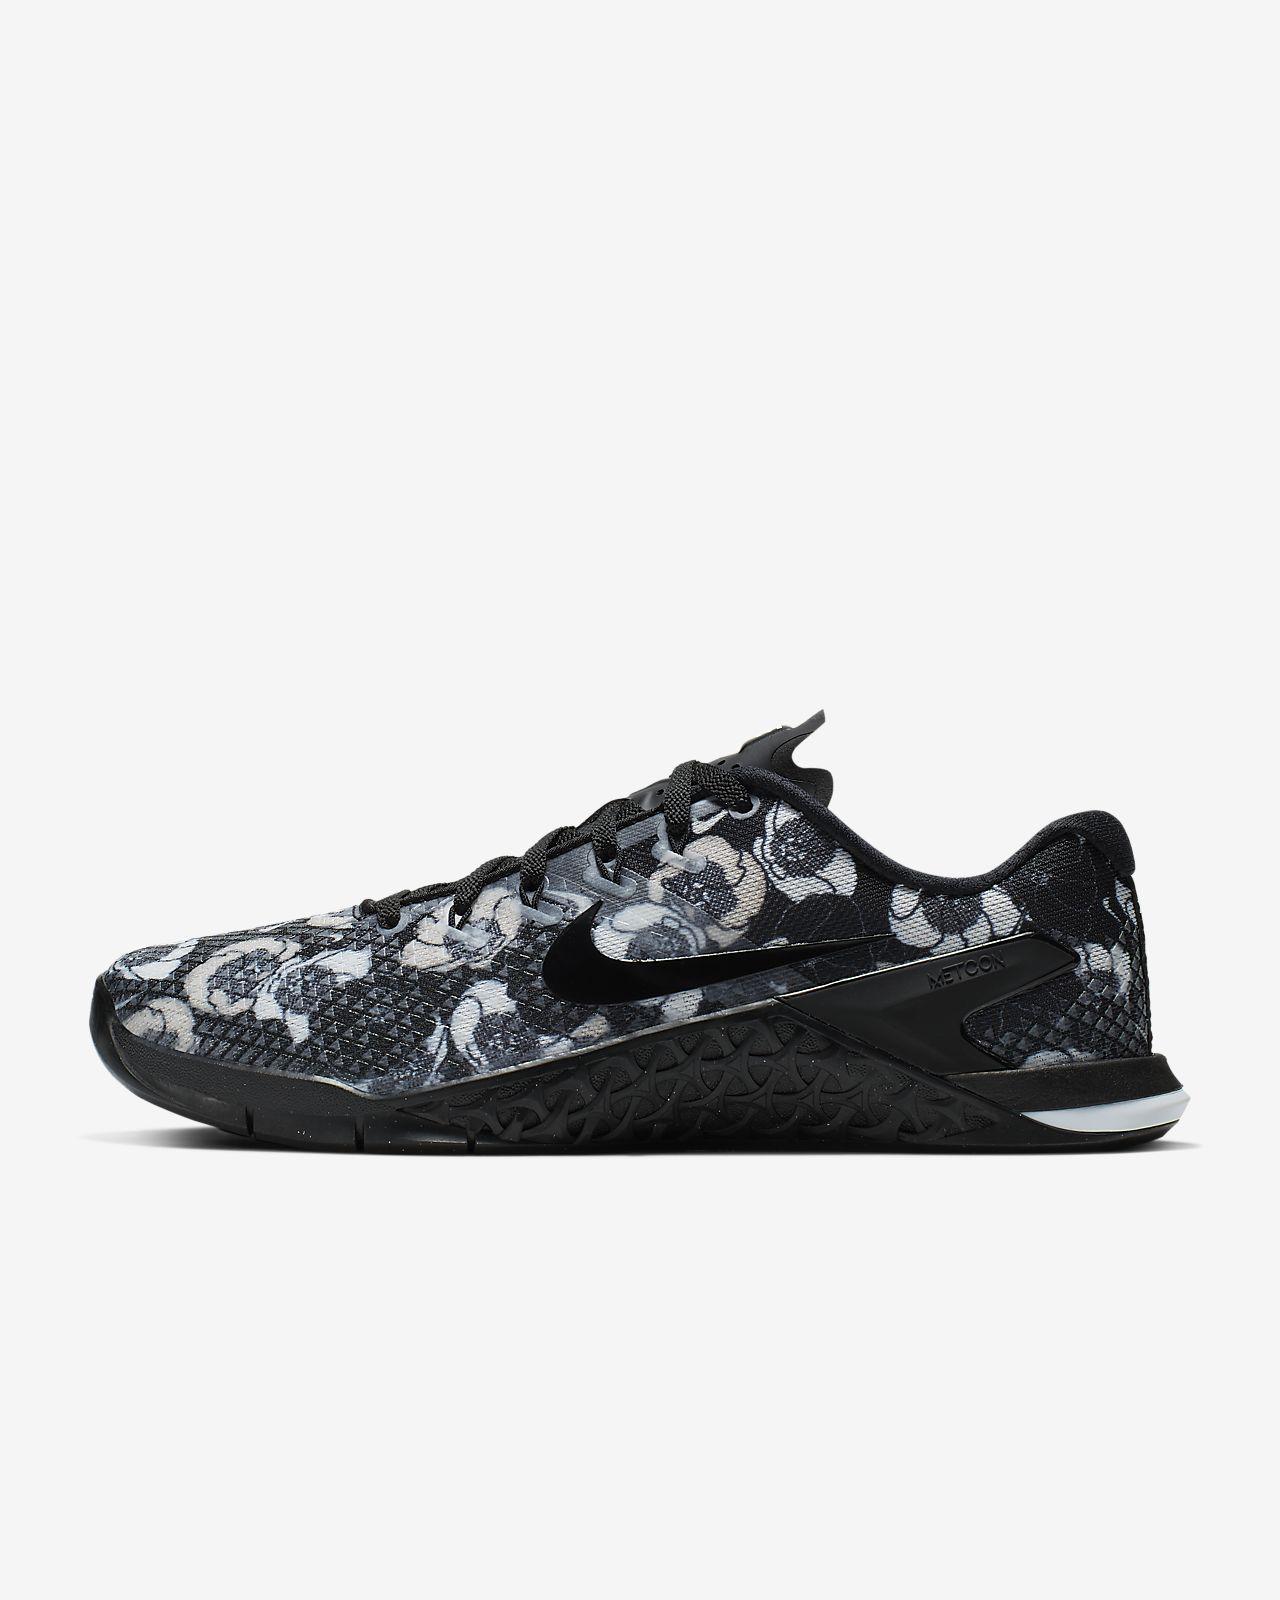 buy popular 6b77f 07540 ... Nike Metcon 4 XD Premium Women s Training Shoe